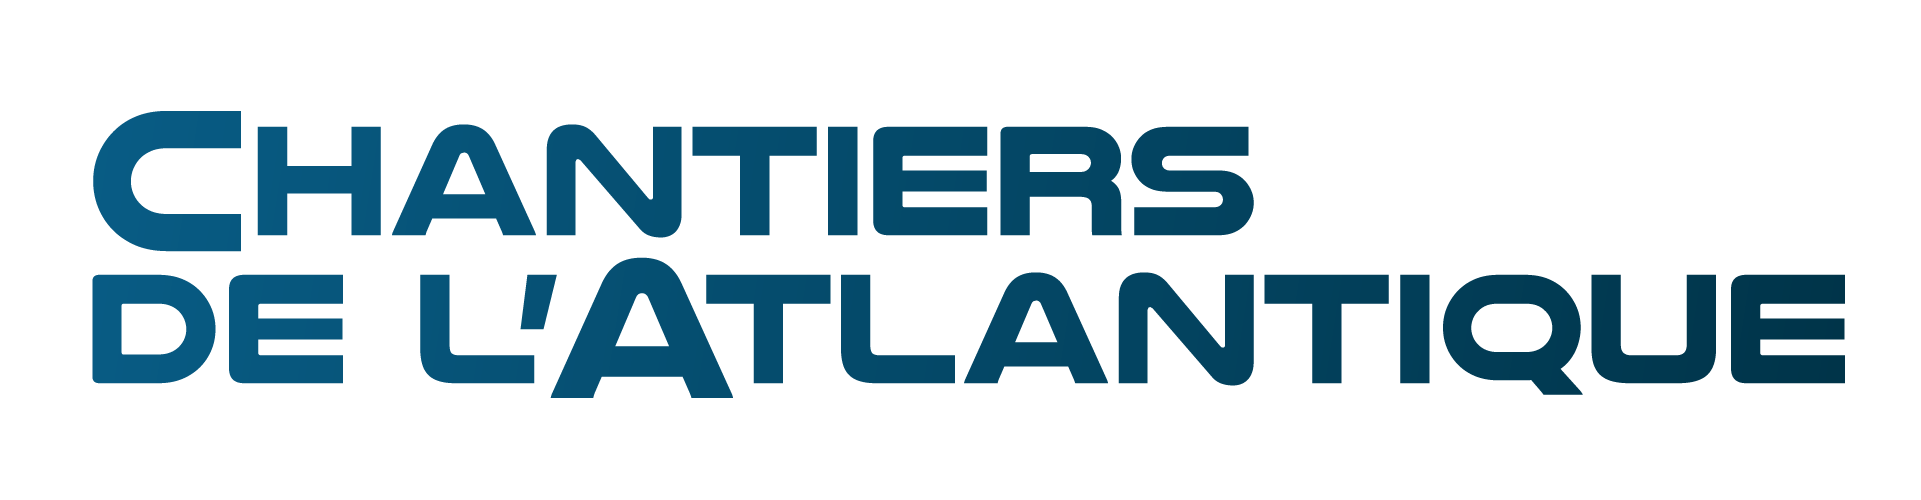 Logo Chantiers Atlantique 1